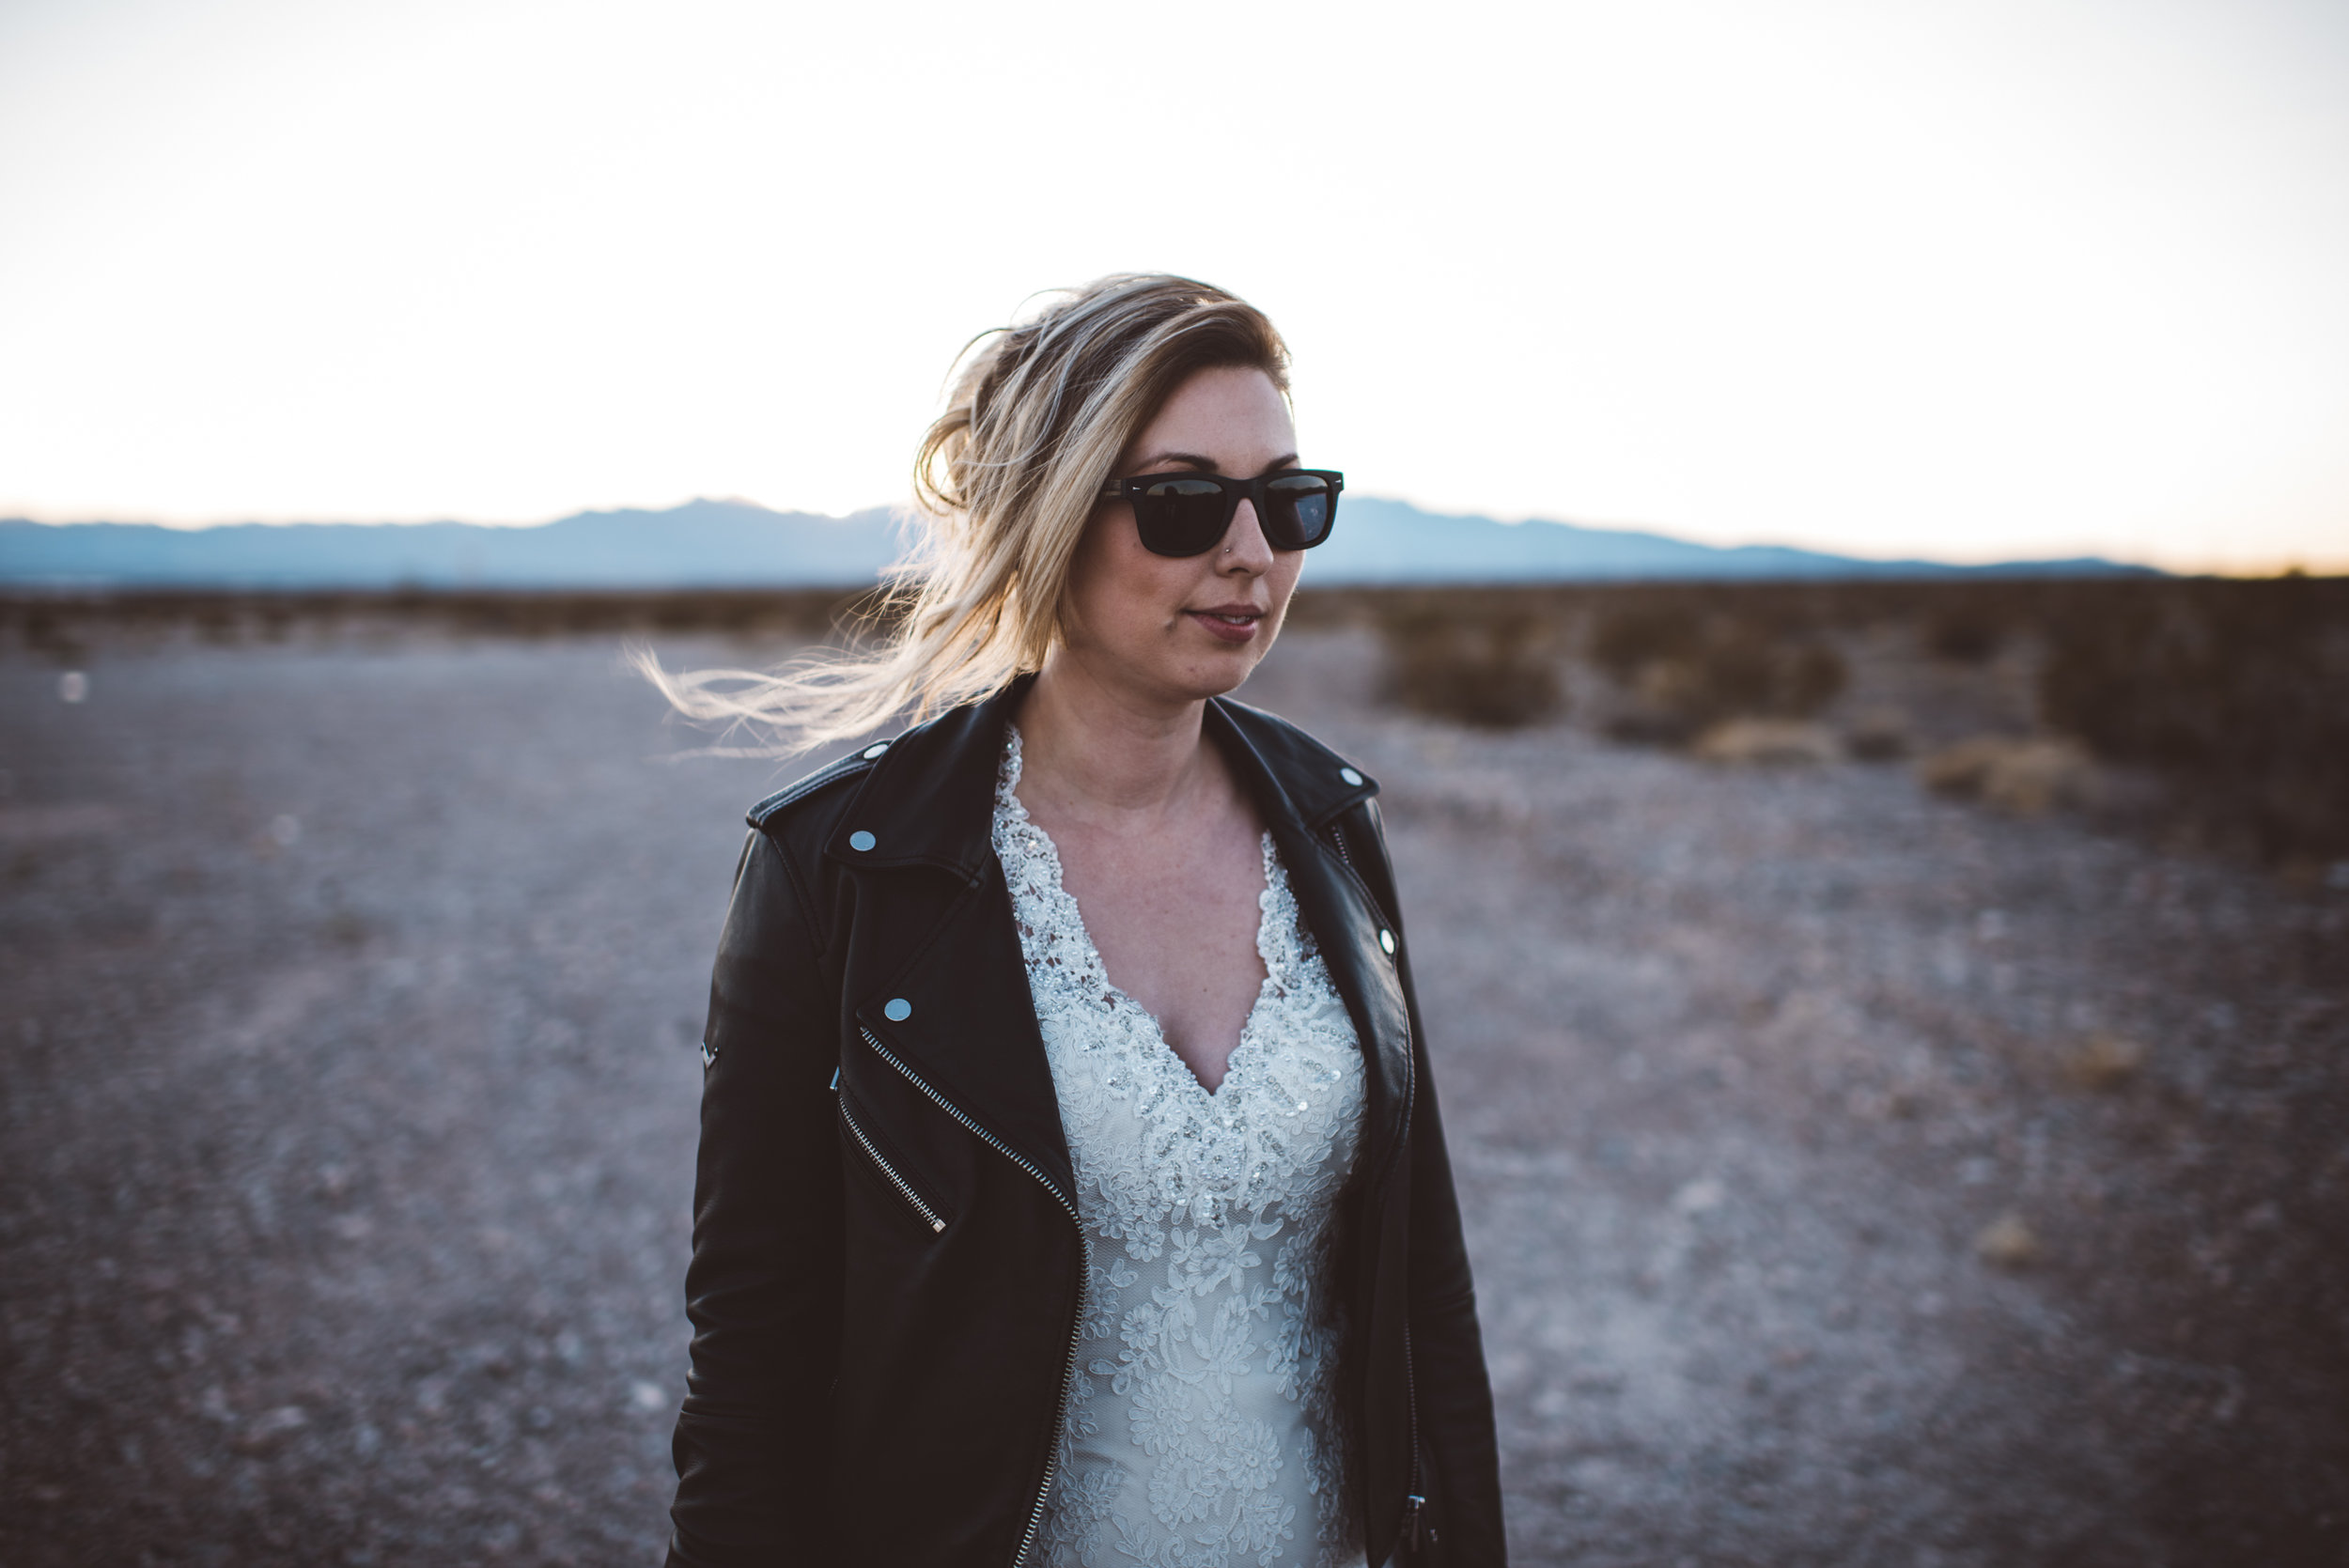 Las Vegas Elopement Photographer Ashley Marie Myers Rock'n Roll Bride-227.jpg